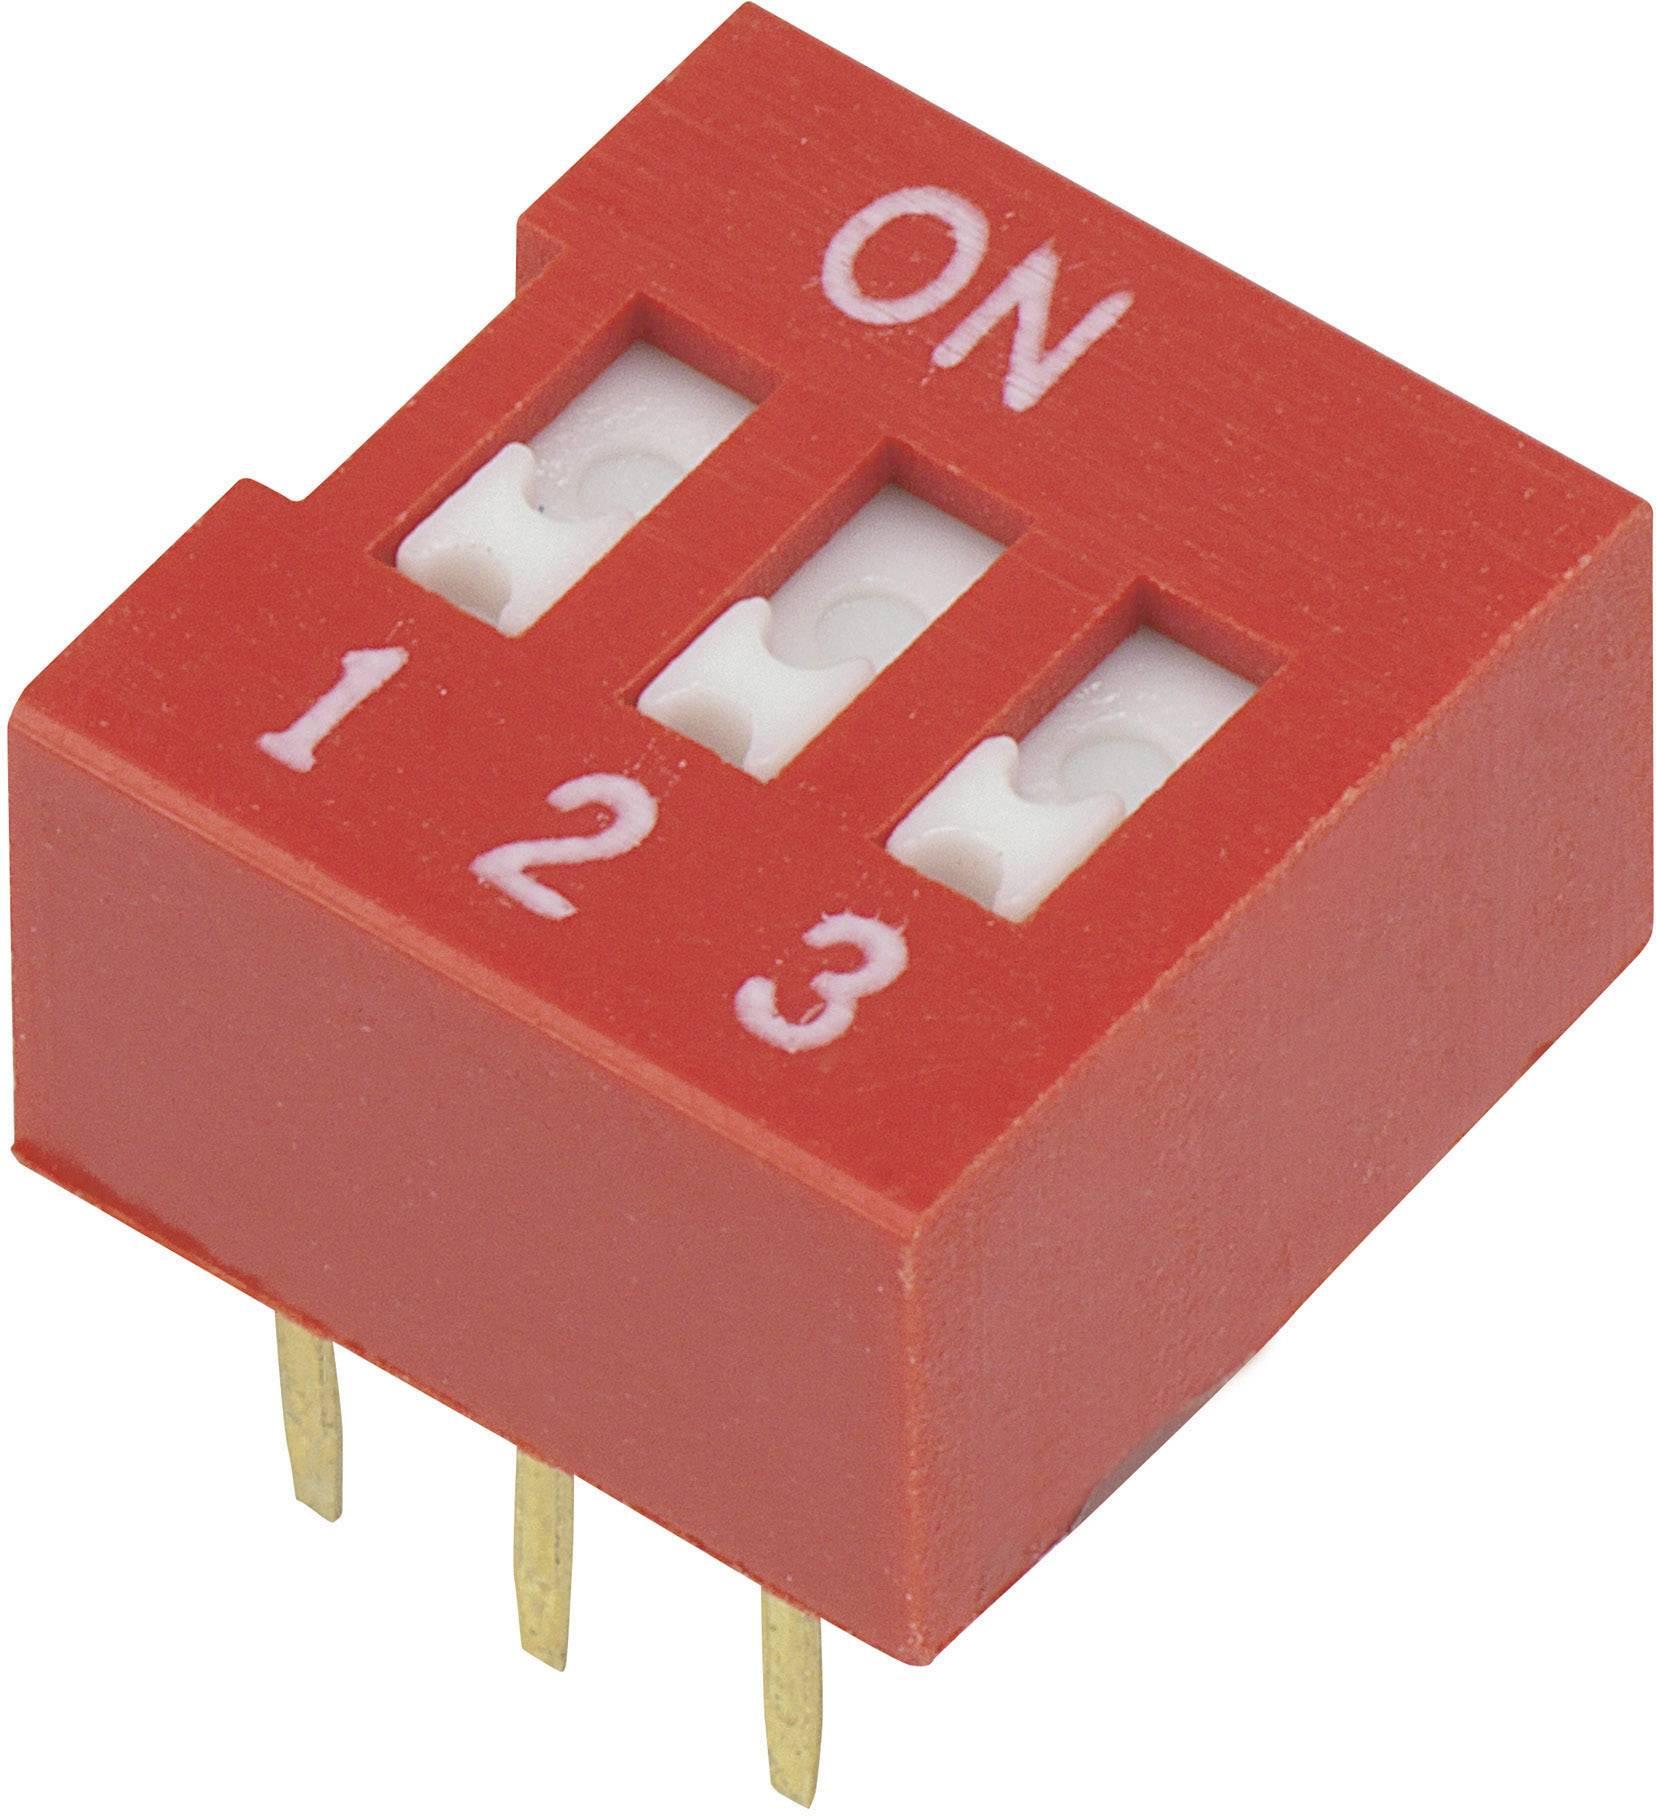 DIP spínač DSR-03, (š x v) 9,9 mm x 5,7 mm